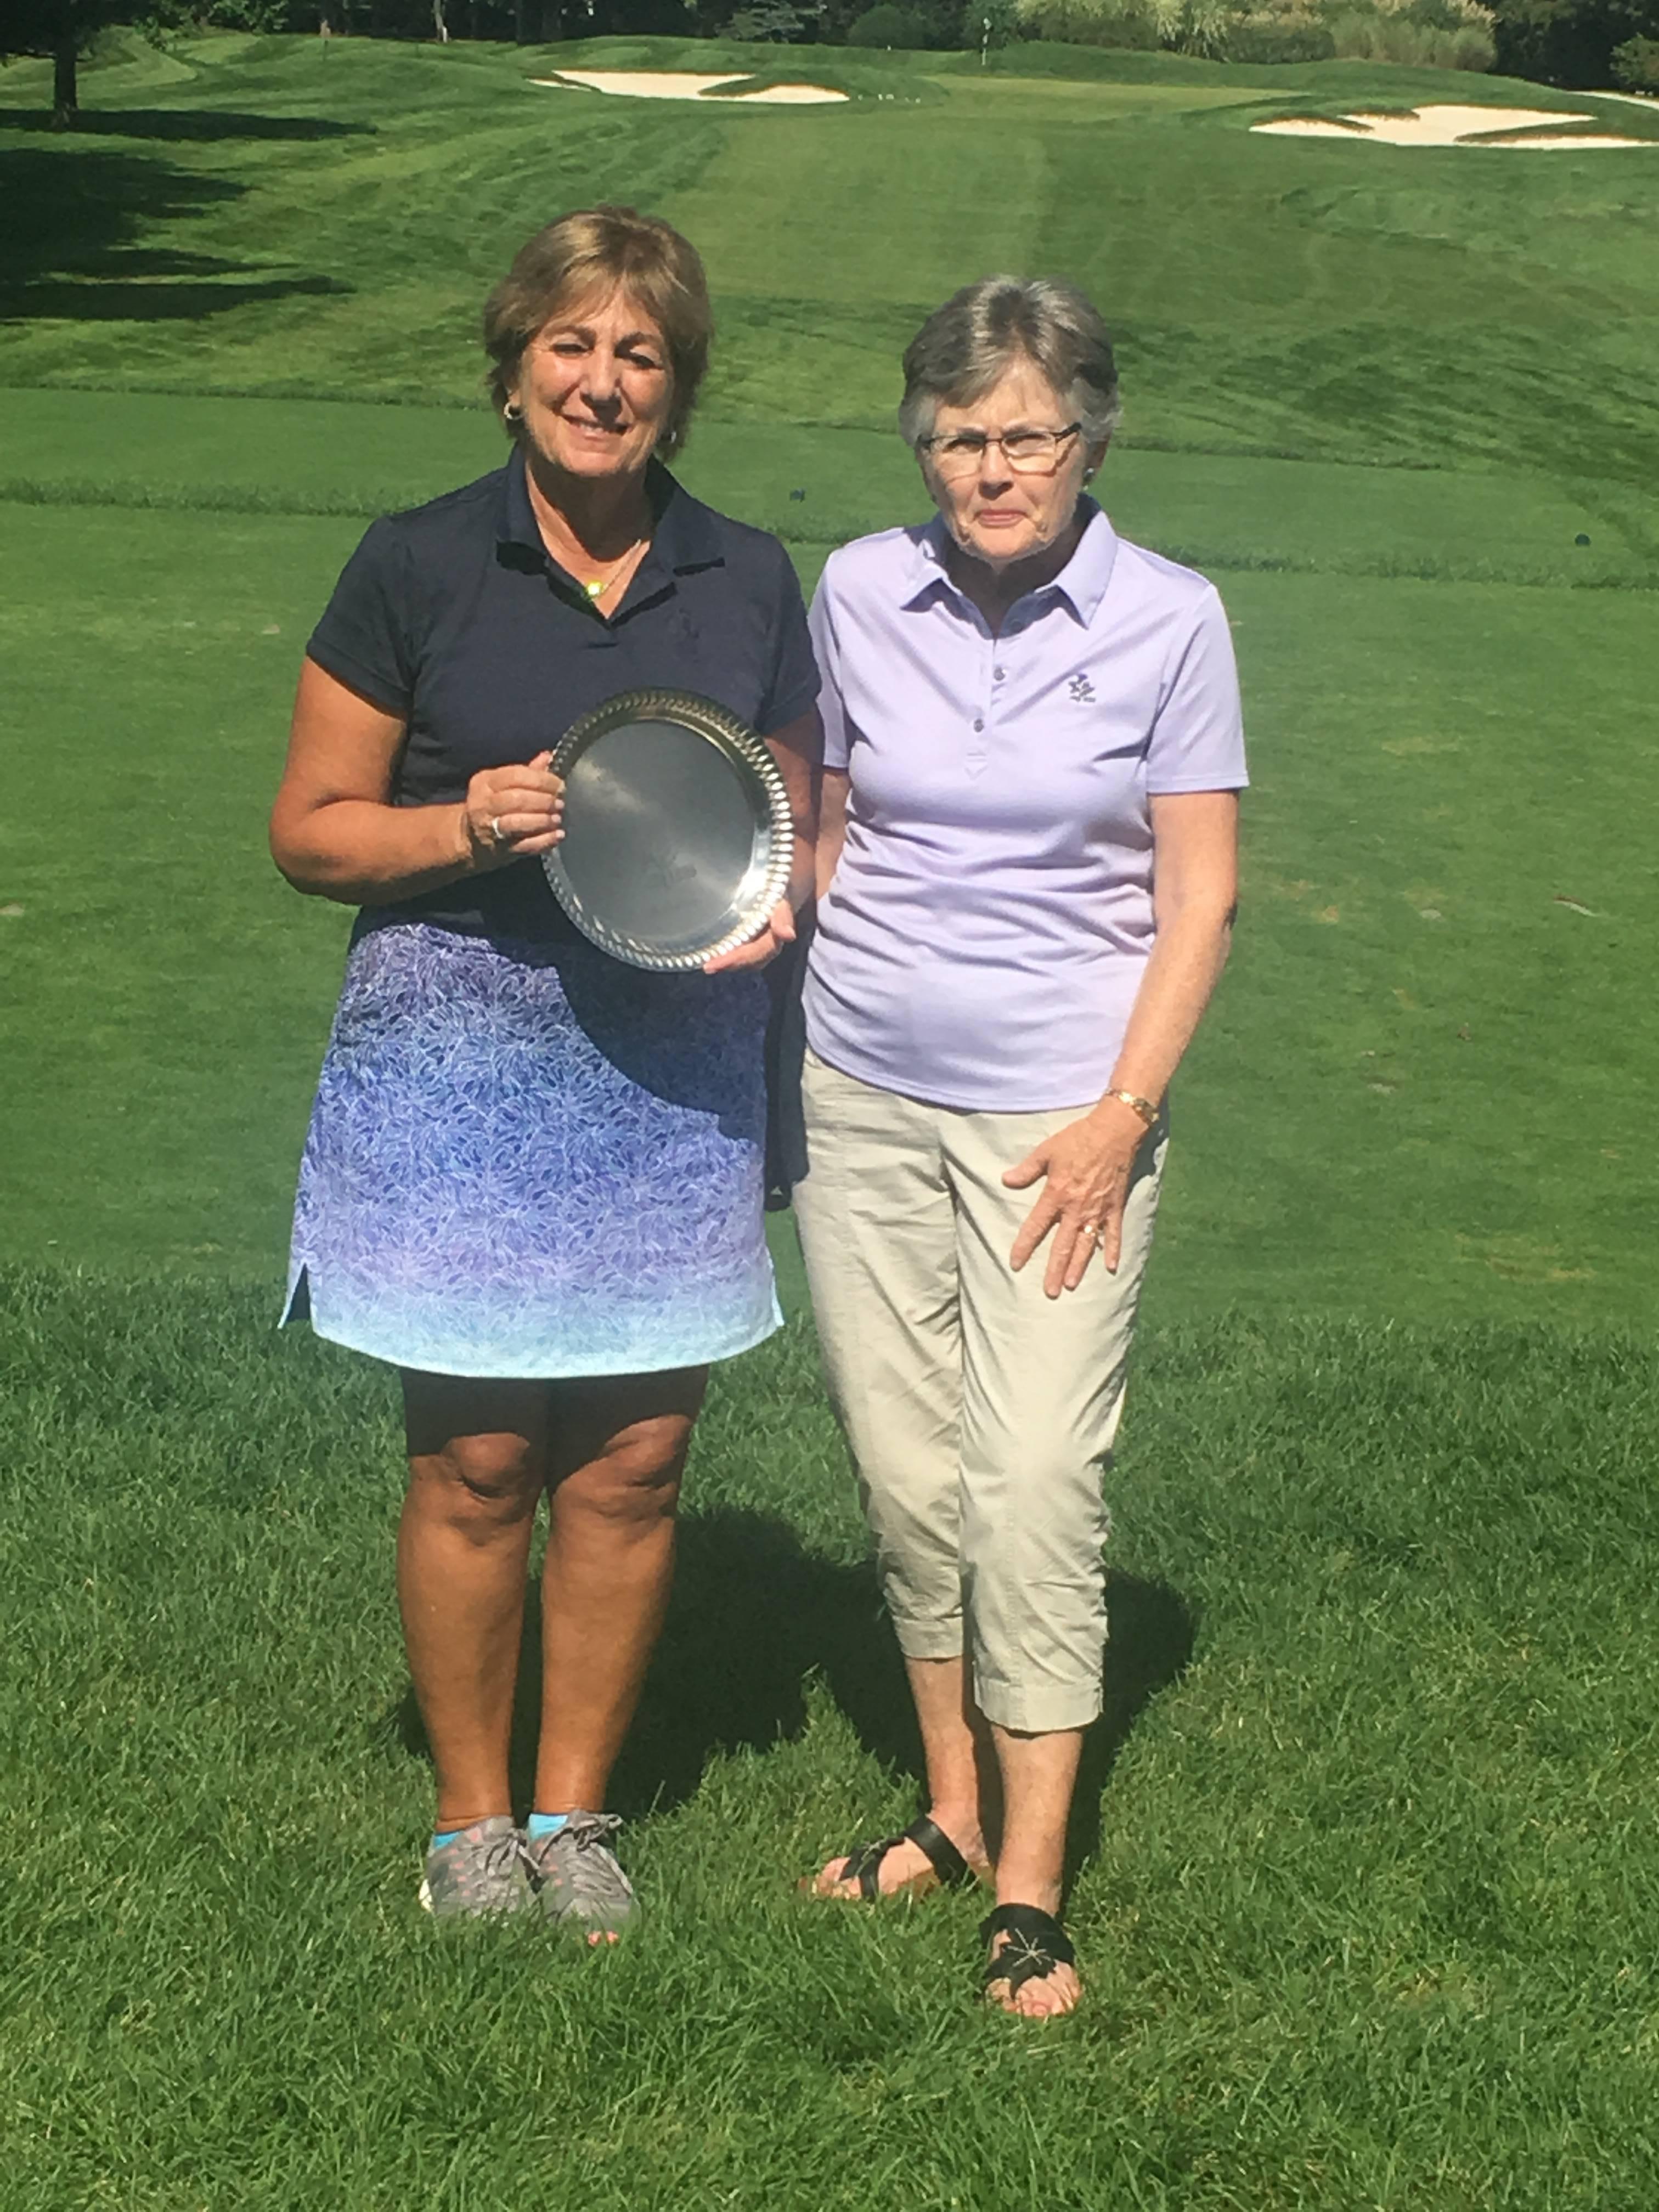 Chatham Resident Wins Madison Golf Club Women's Flight A Championship